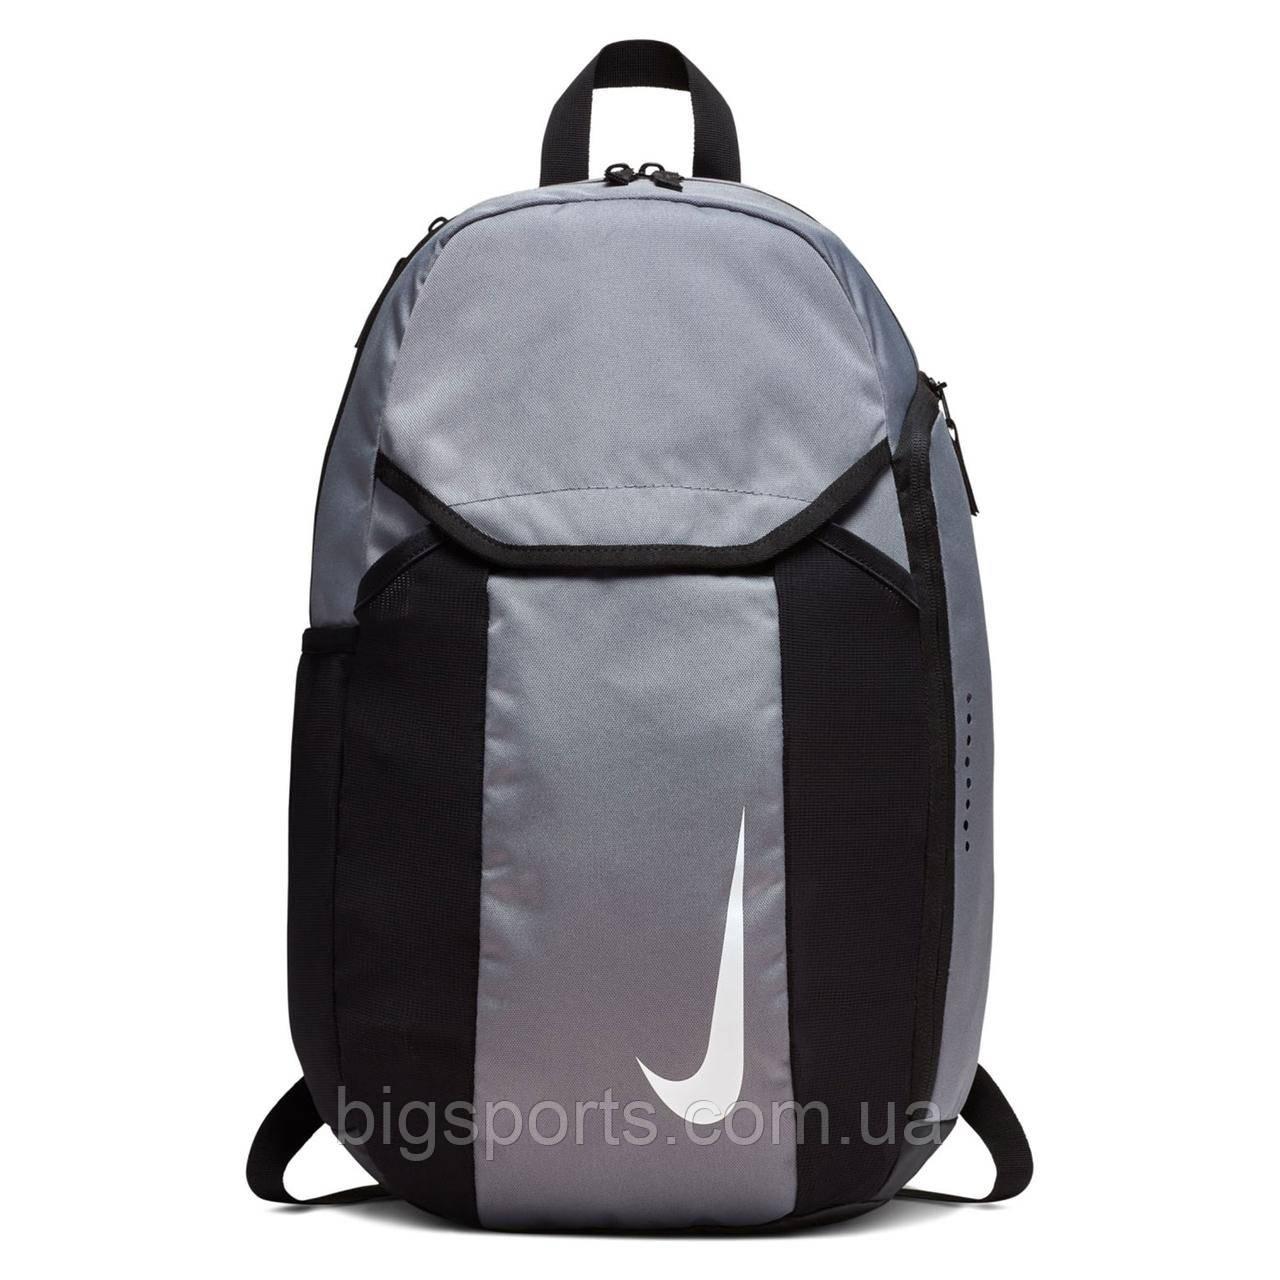 Рюкзак спортивный Nike Academy Team 30L (арт. BA5501-065)